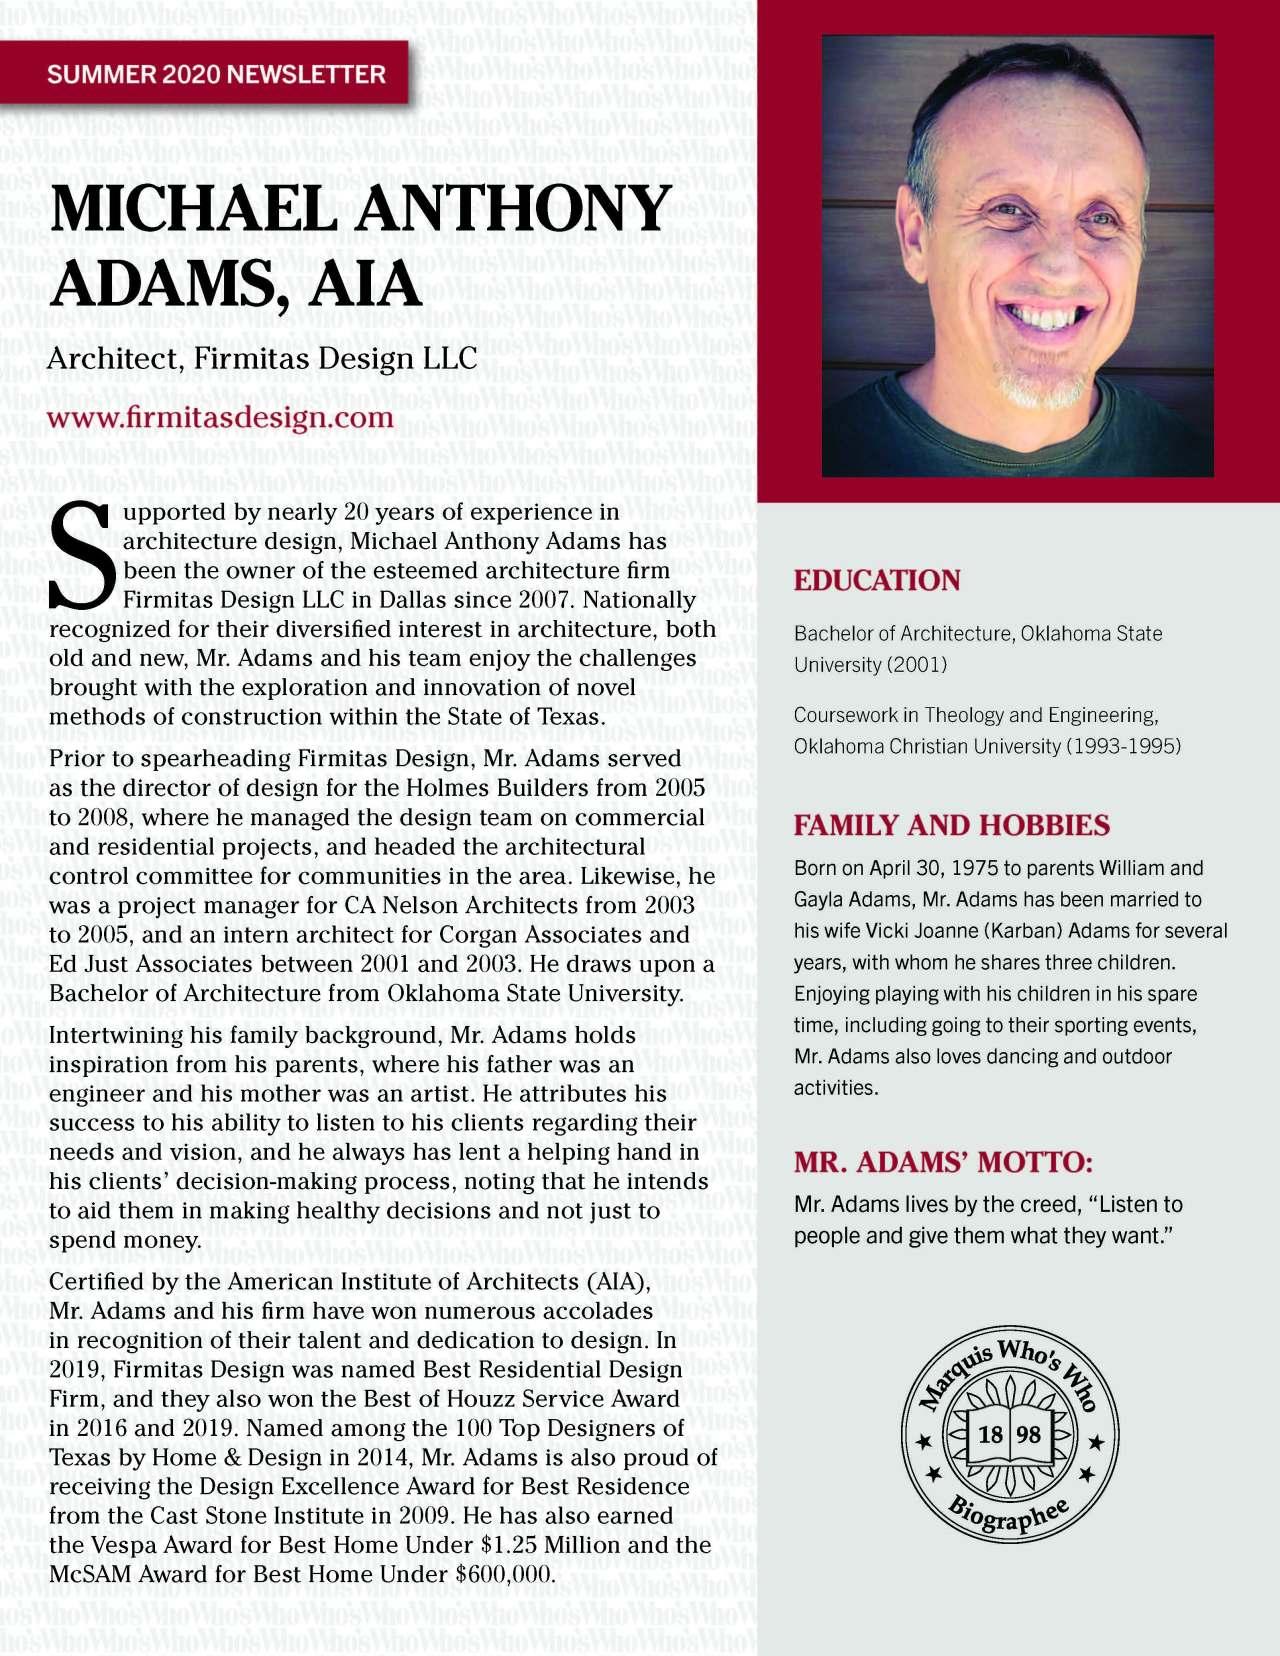 Adams, Michael 4804525_4004804525 Newsletter